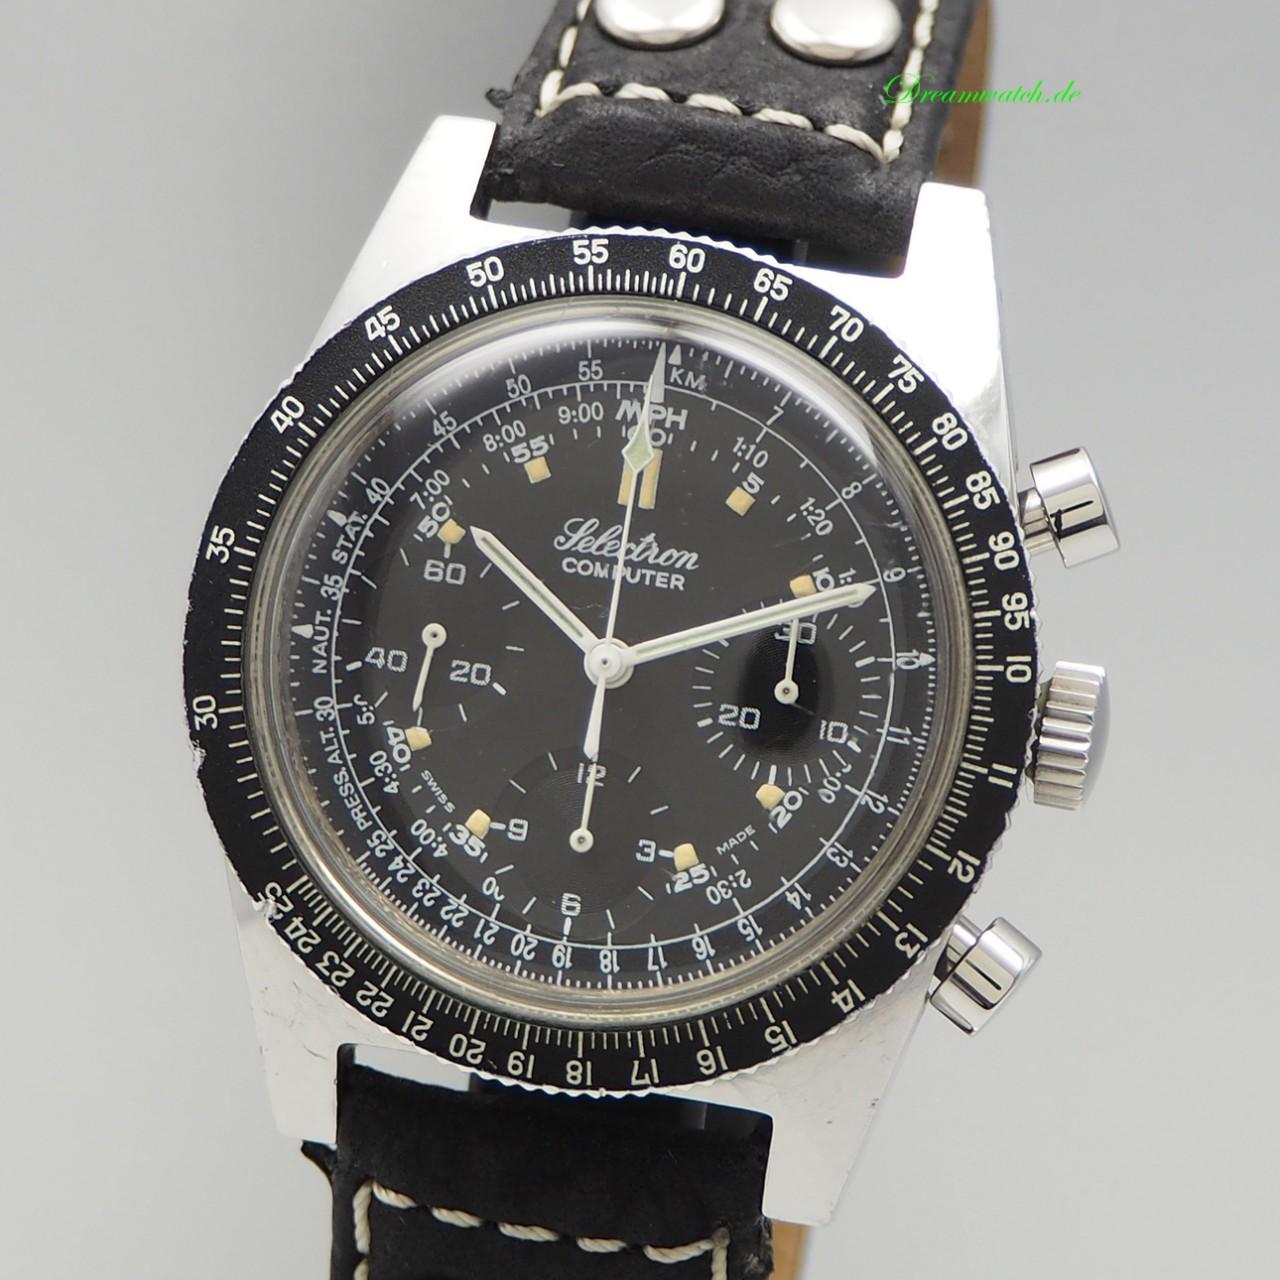 Ollech Wajs/ Selectron Cumputer Chronograph Vintage Valjoux 72